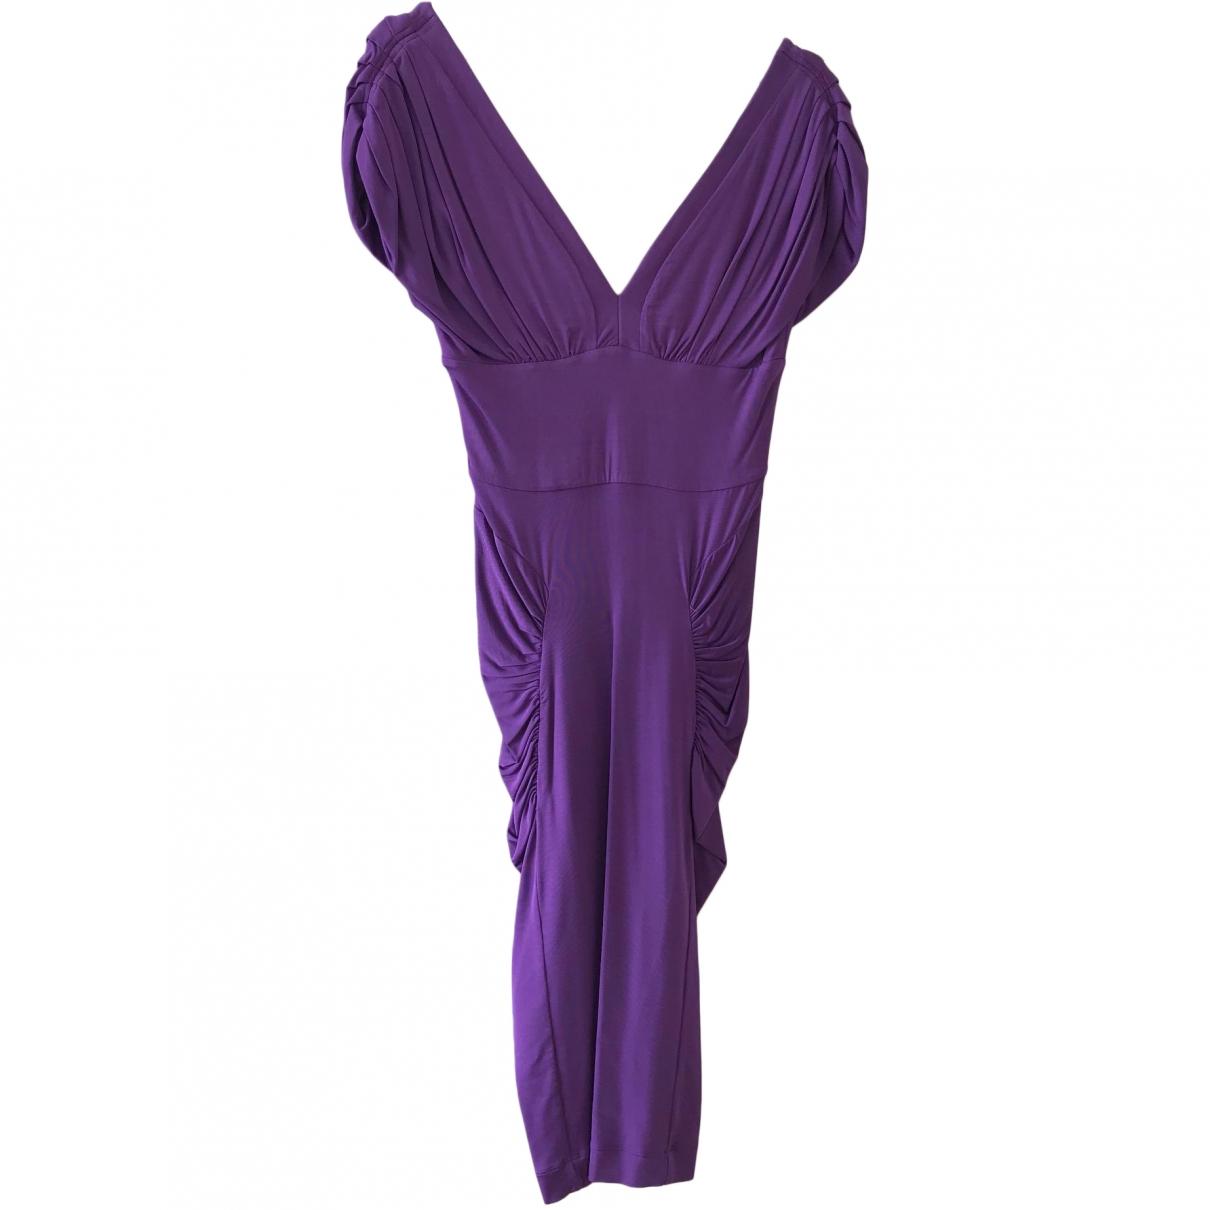 Just Cavalli \N Purple dress for Women 40 IT